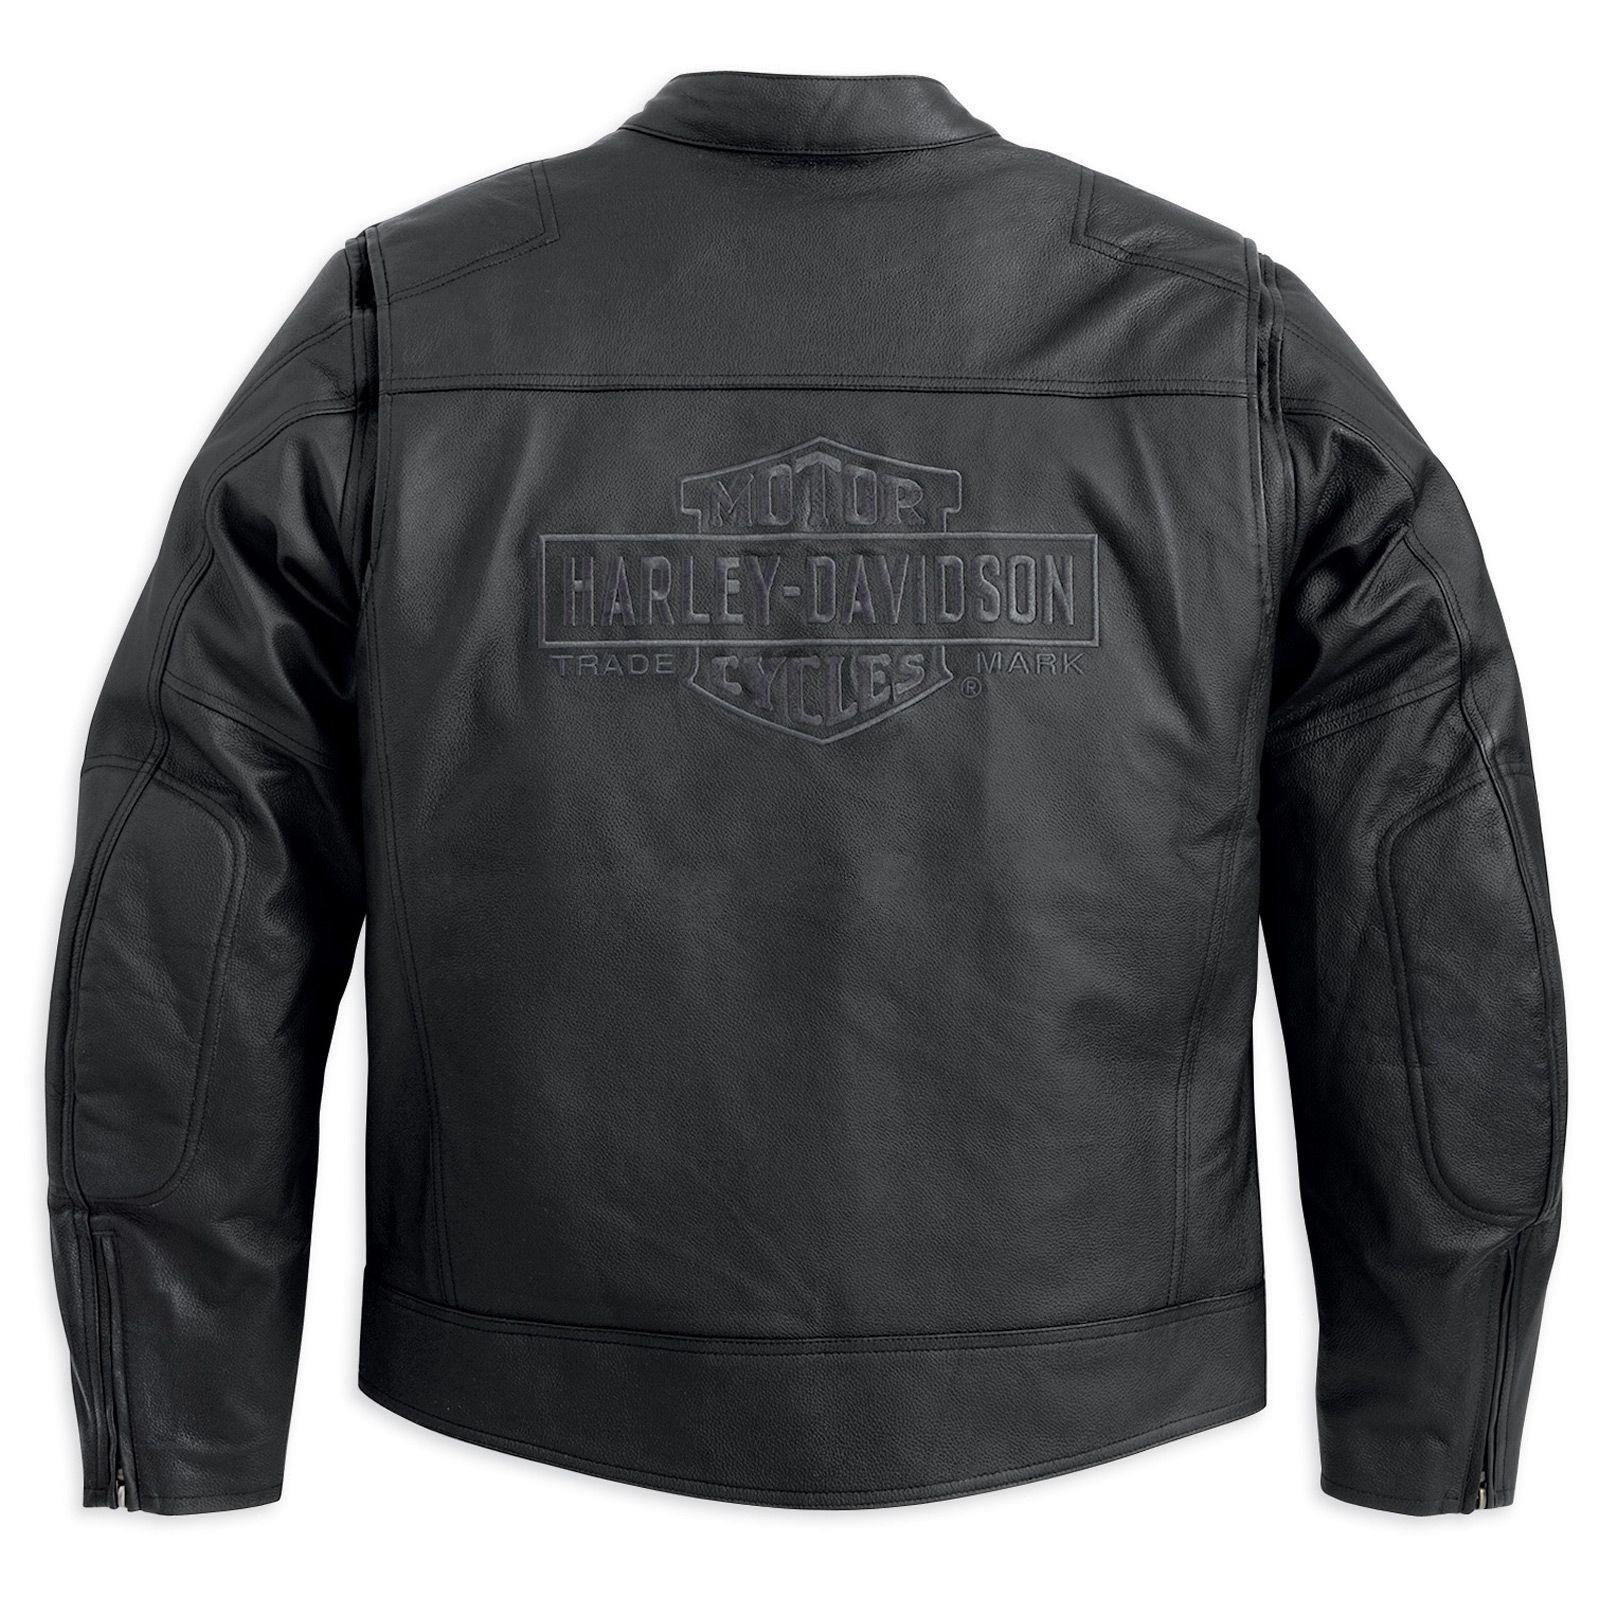 Leather jacket killer b&q - Harley Davidson Leather Coats Harley Davidson Traditional Leather Jacket Black Medium 38